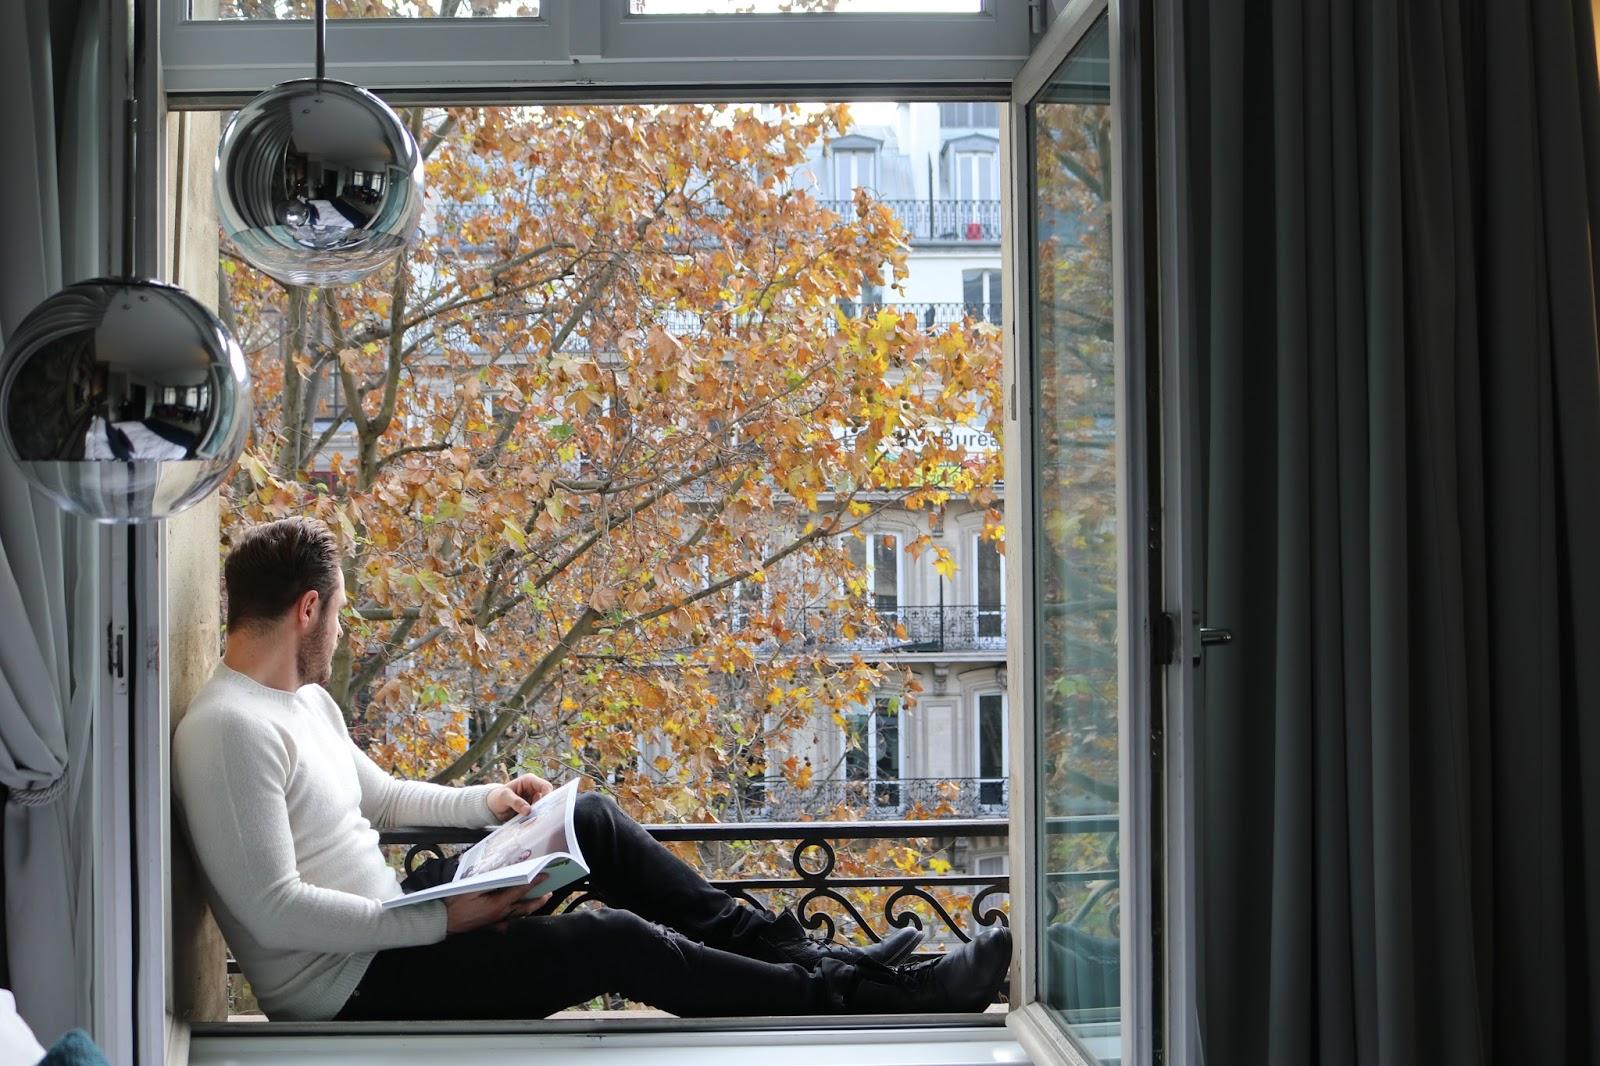 Hotel Indigo, Paris, France, KALANCHOE, Ben Heath